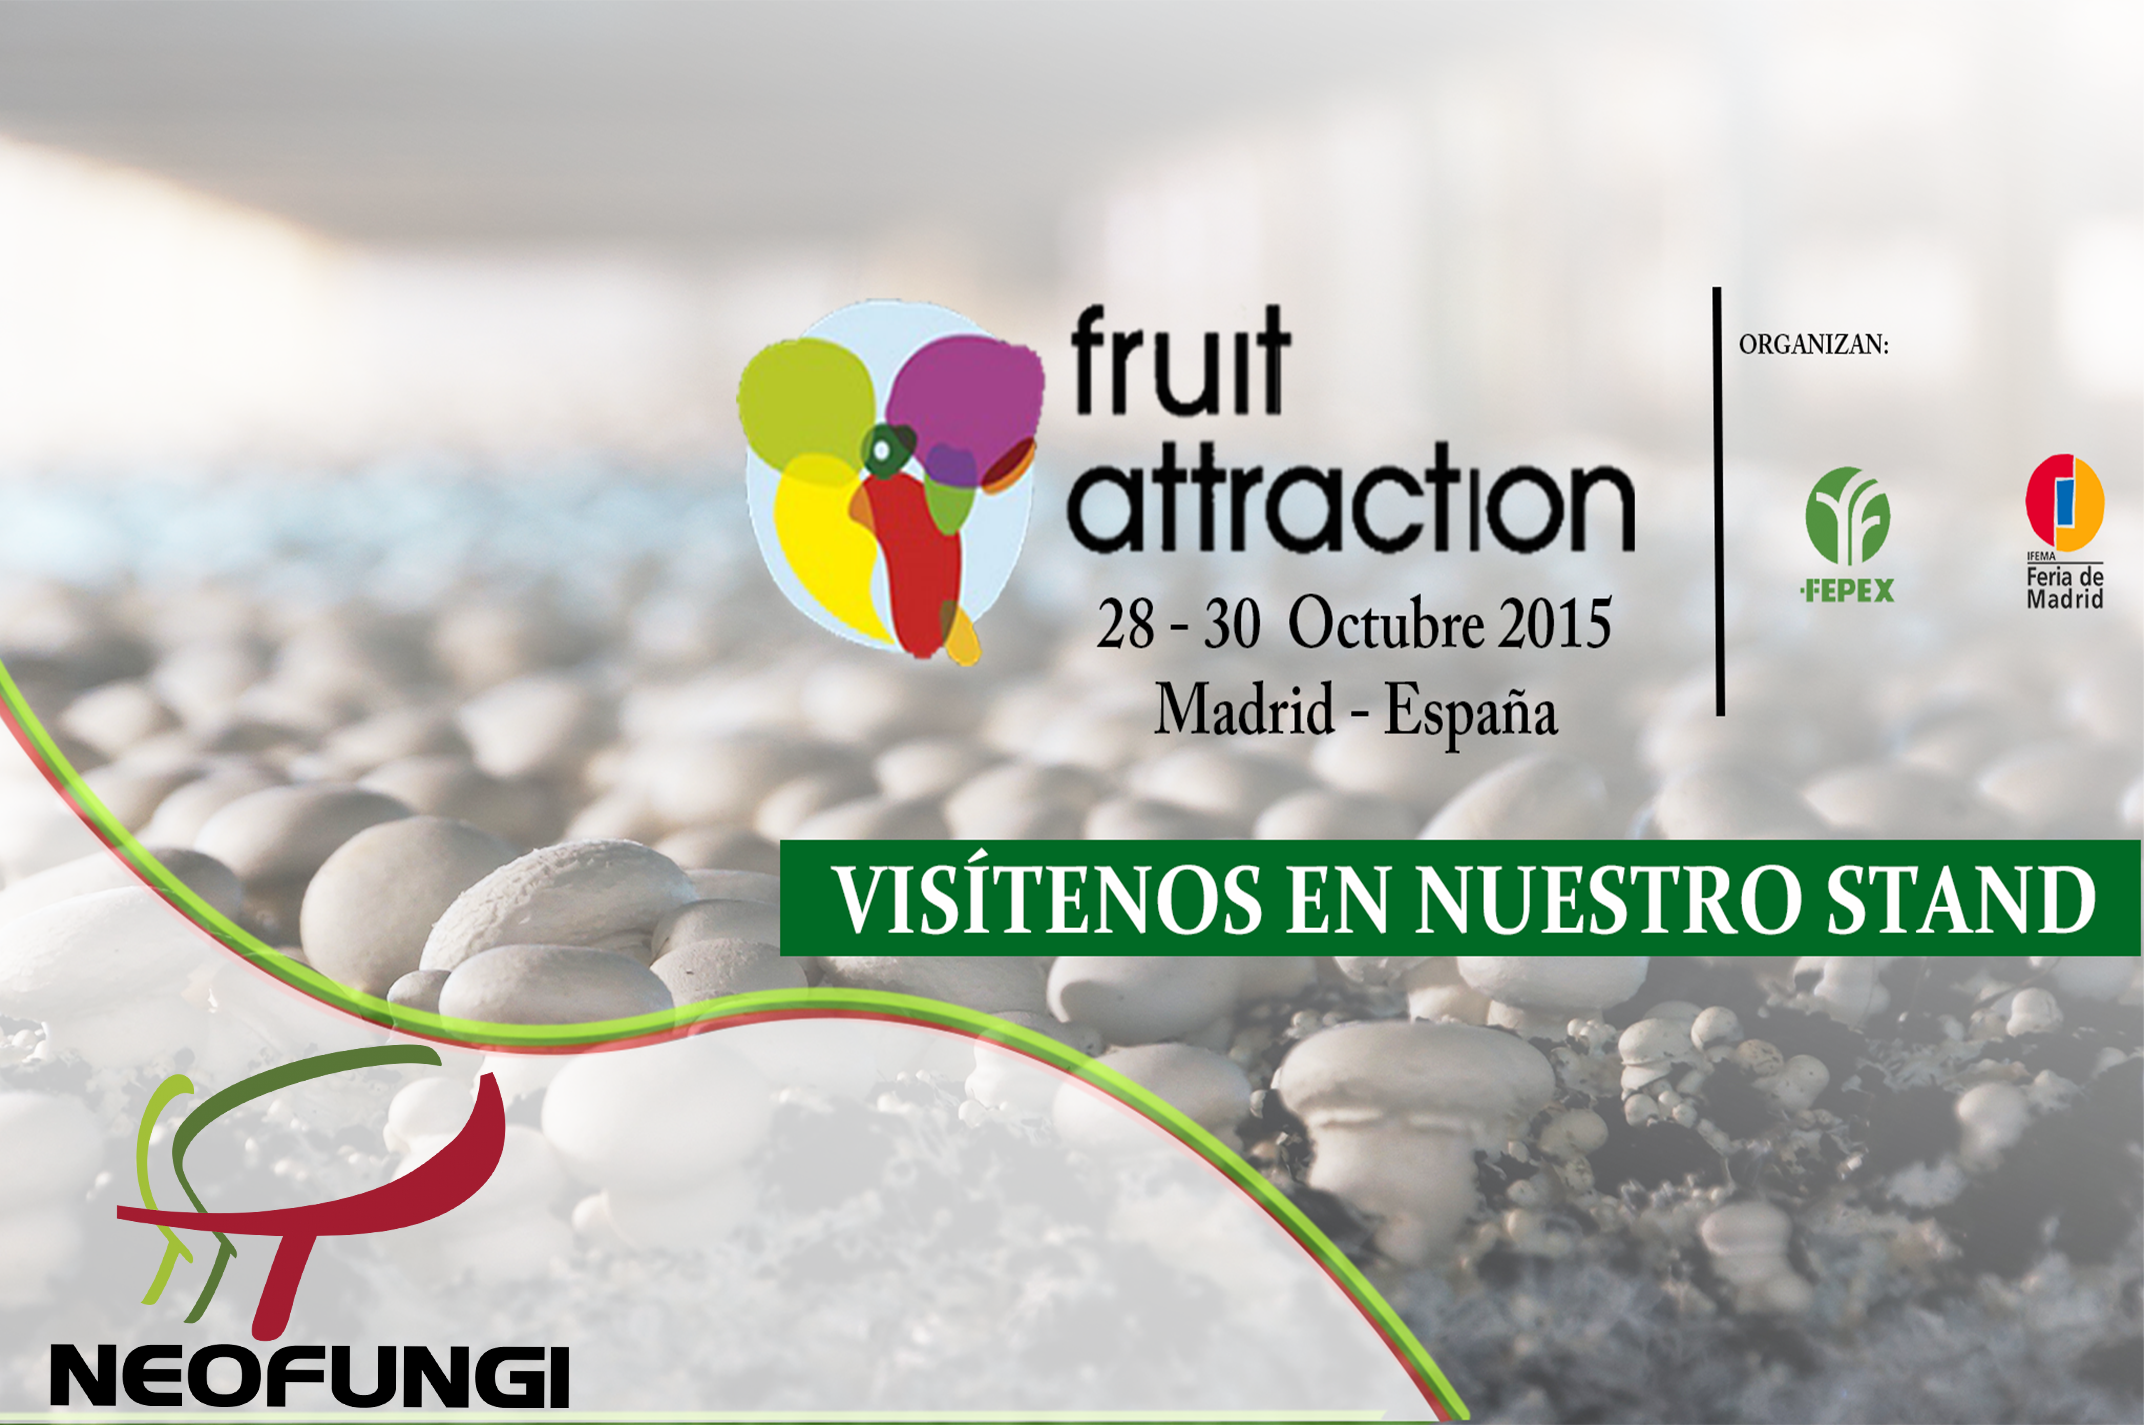 Neofungi Fruit attraction 2015